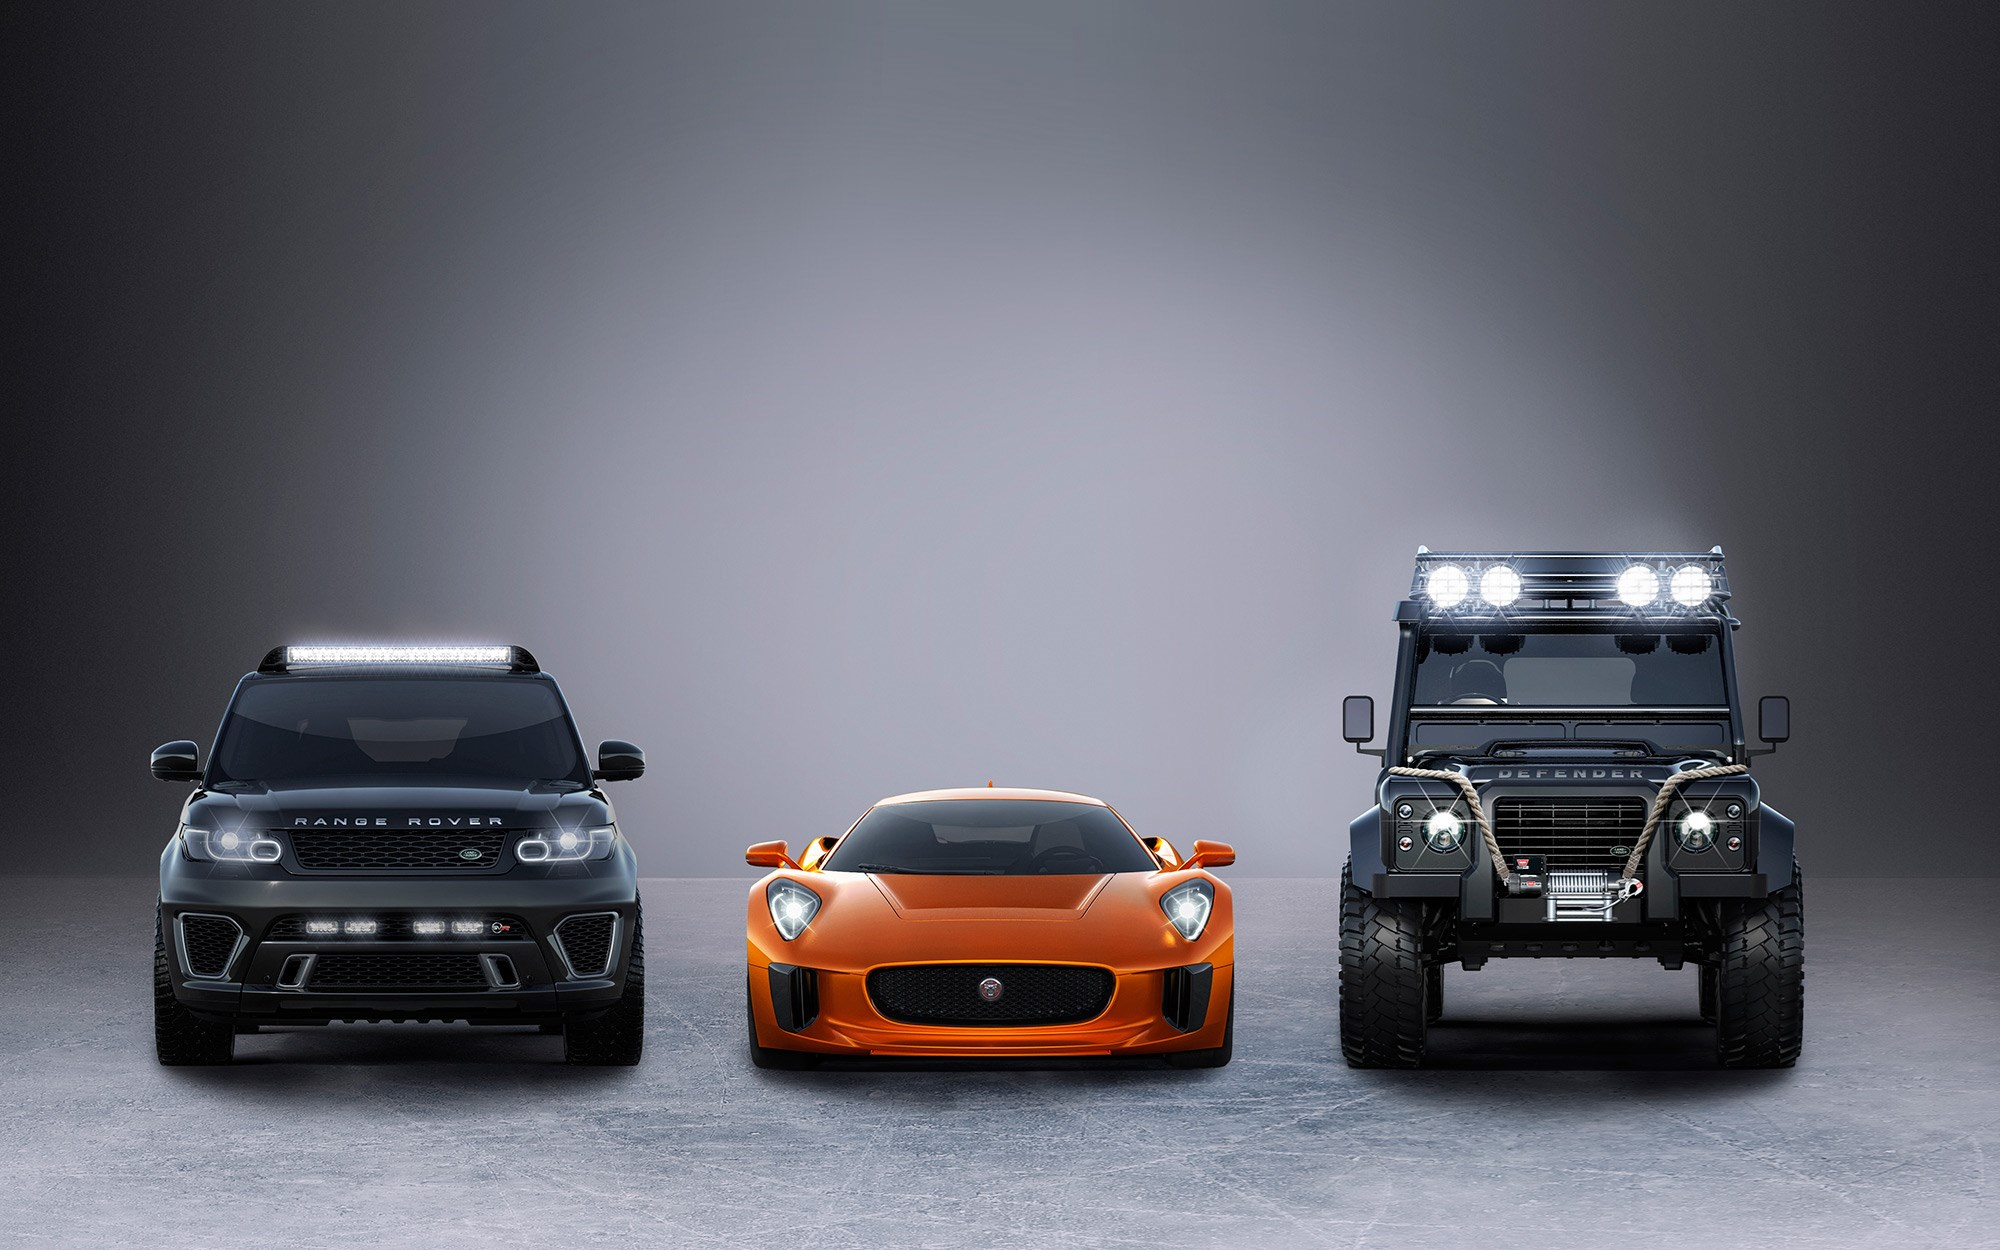 Jaguar C-X75 supercar, toughened-up Land Rover to star in next Bond